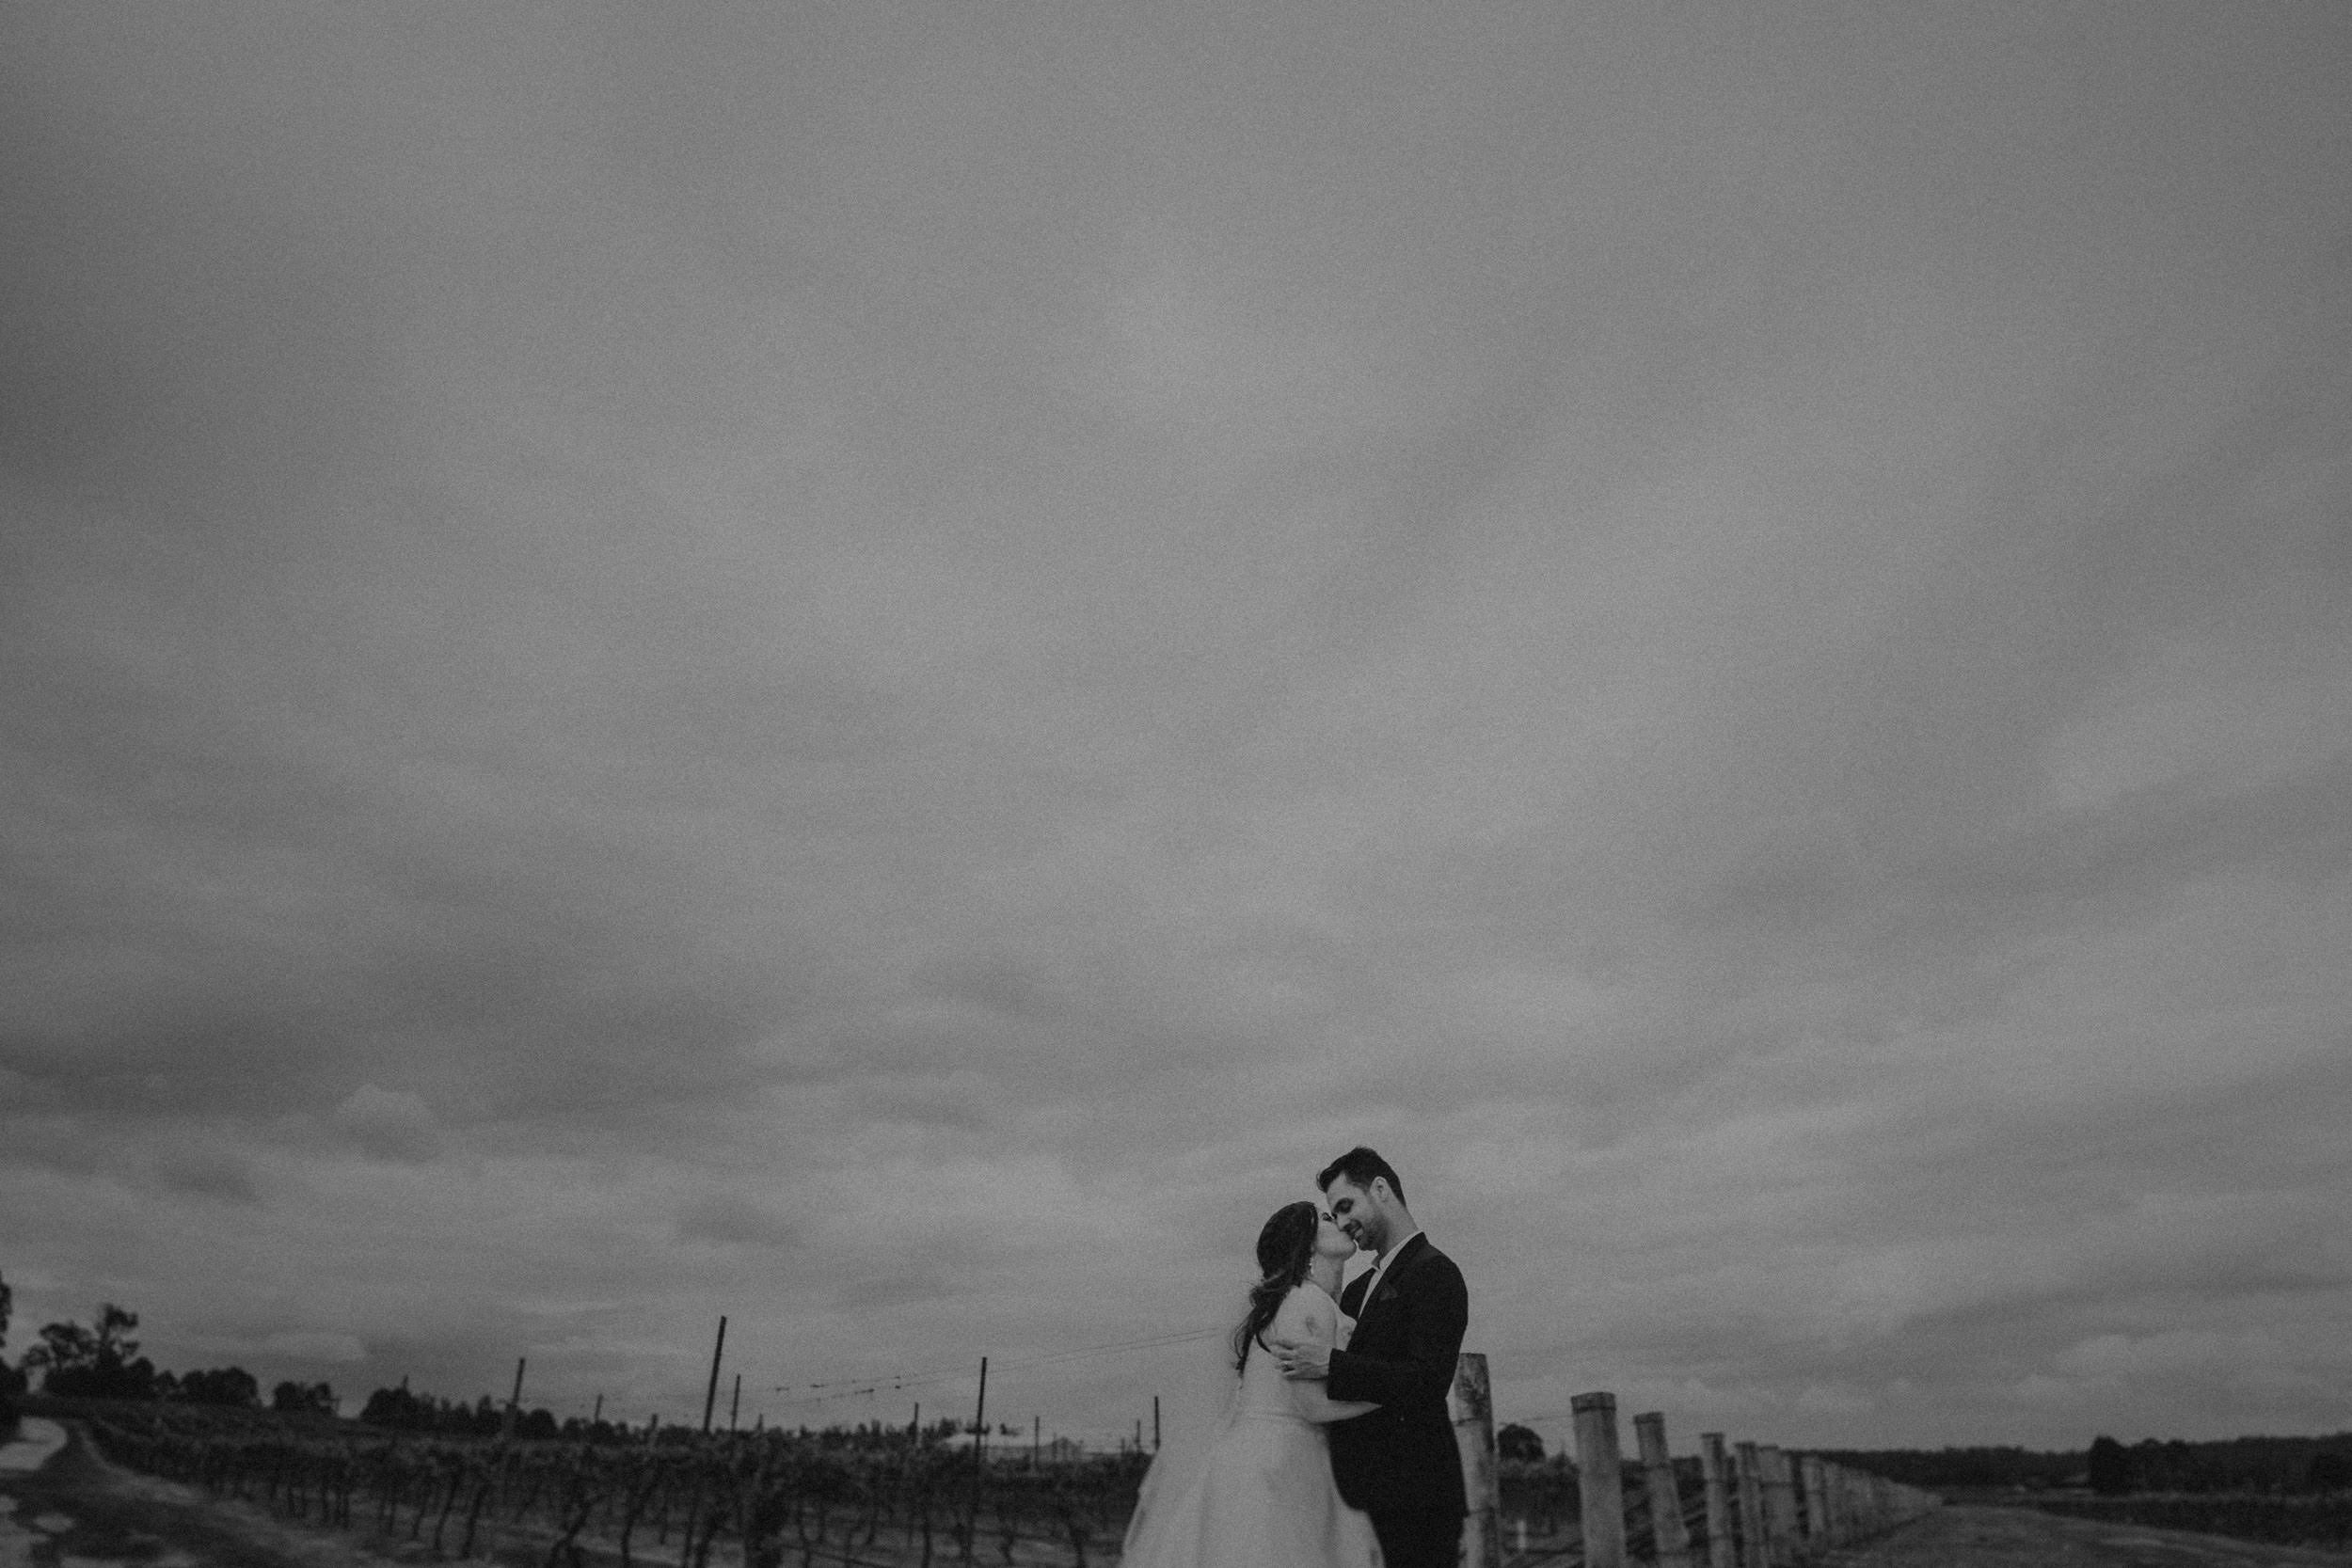 s+j_top_elopement wedding photography_kings & thieves_blog - 383.jpg